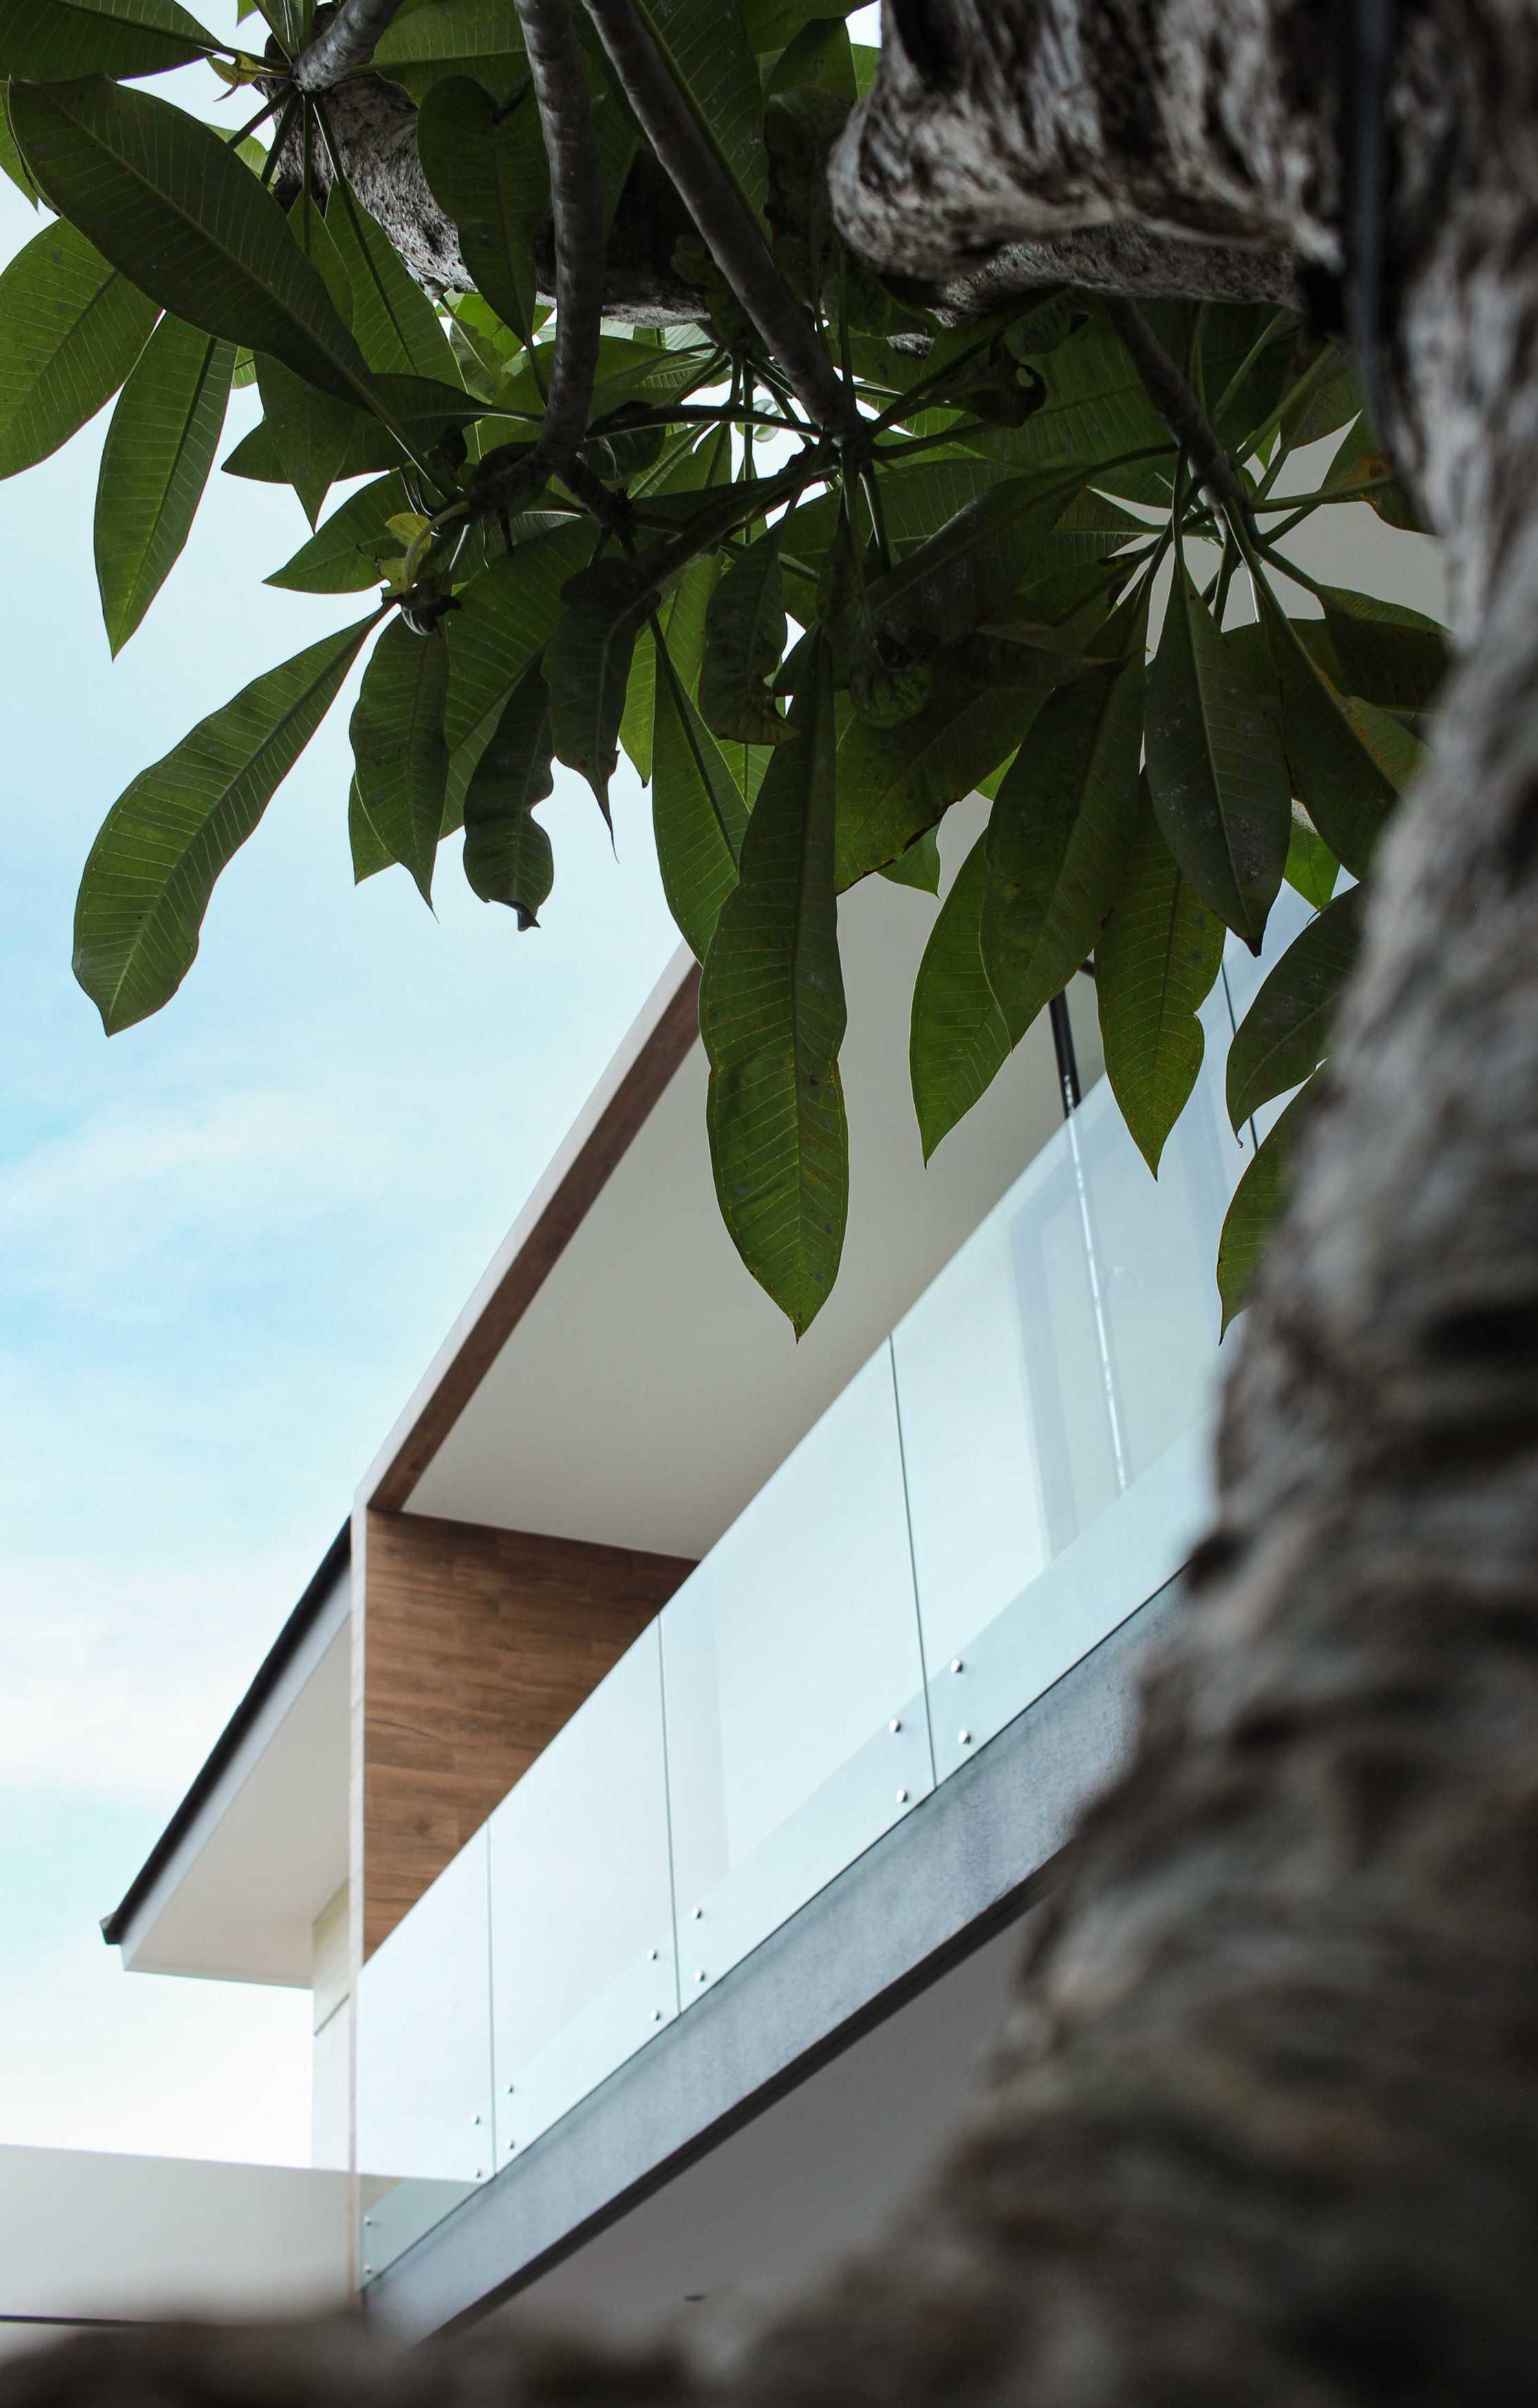 Y0 Design Architect S House Kec. Srono, Kabupaten Banyuwangi, Jawa Timur, Indonesia Kec. Srono, Kabupaten Banyuwangi, Jawa Timur, Indonesia Yohanes-Iswara-Limandjaya-S-House   121087